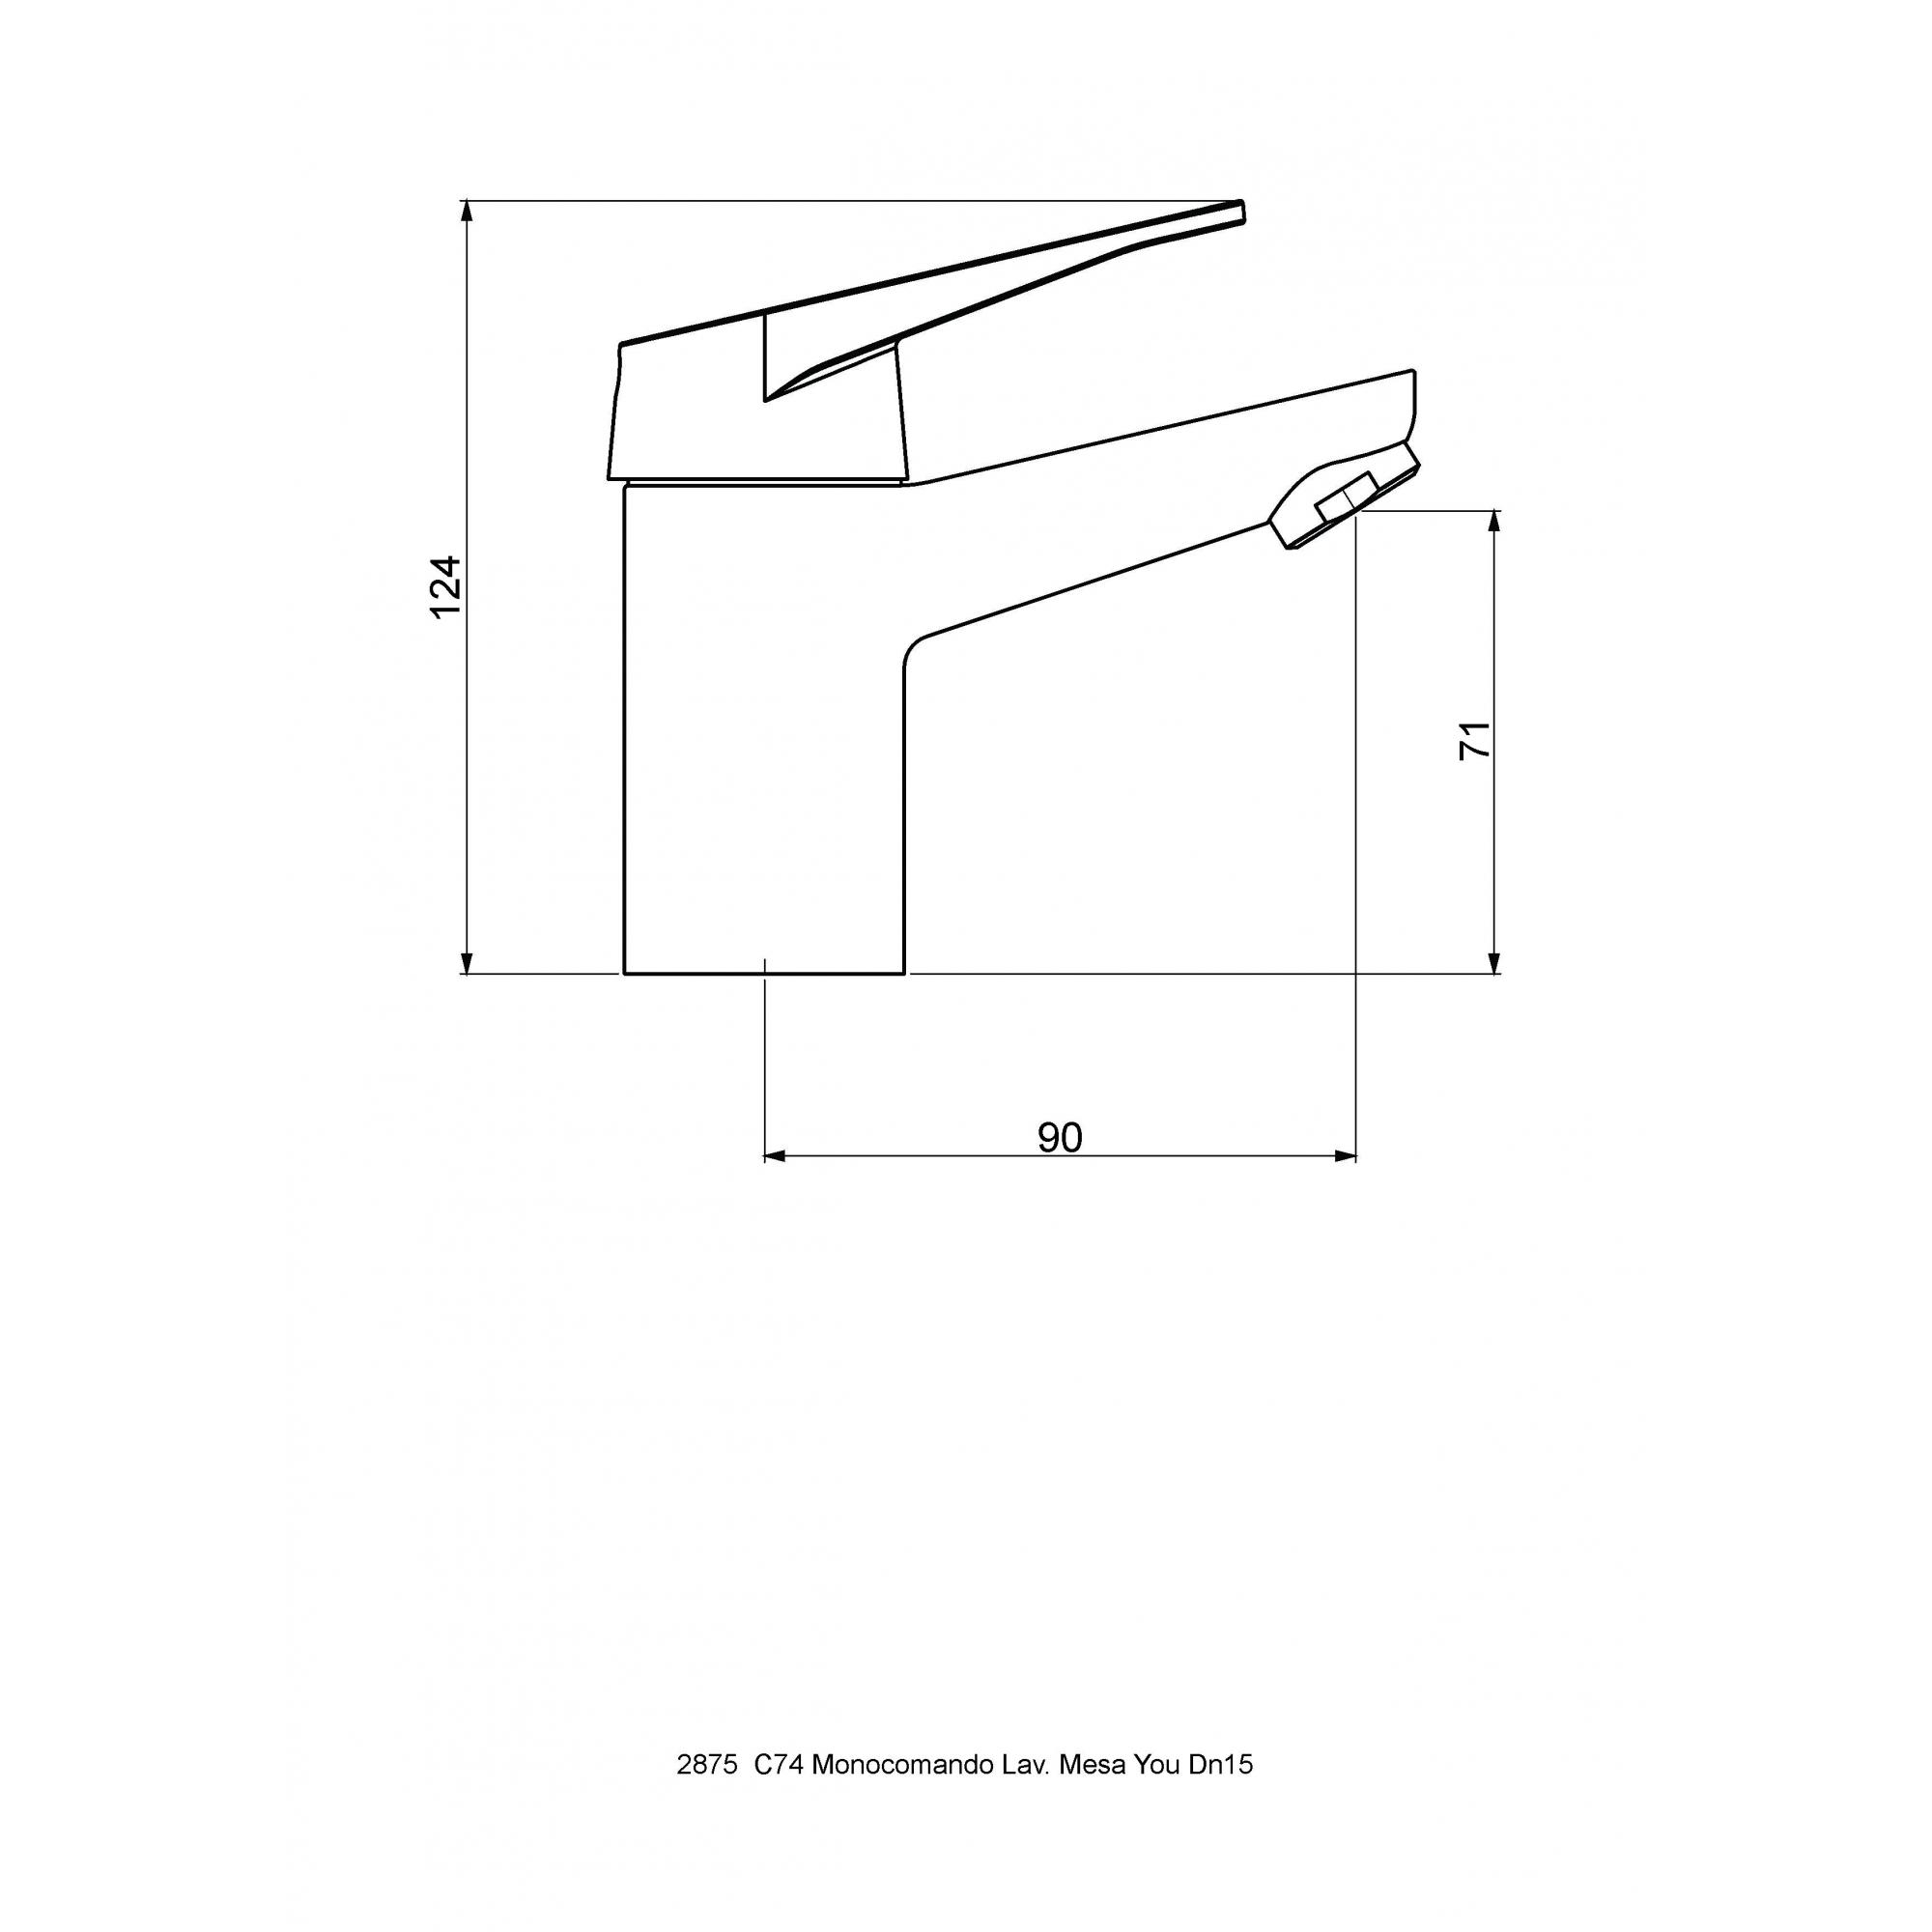 Misturador Monocomando Lavatório Mesa You Dn15 2875 C74 - INATIVO